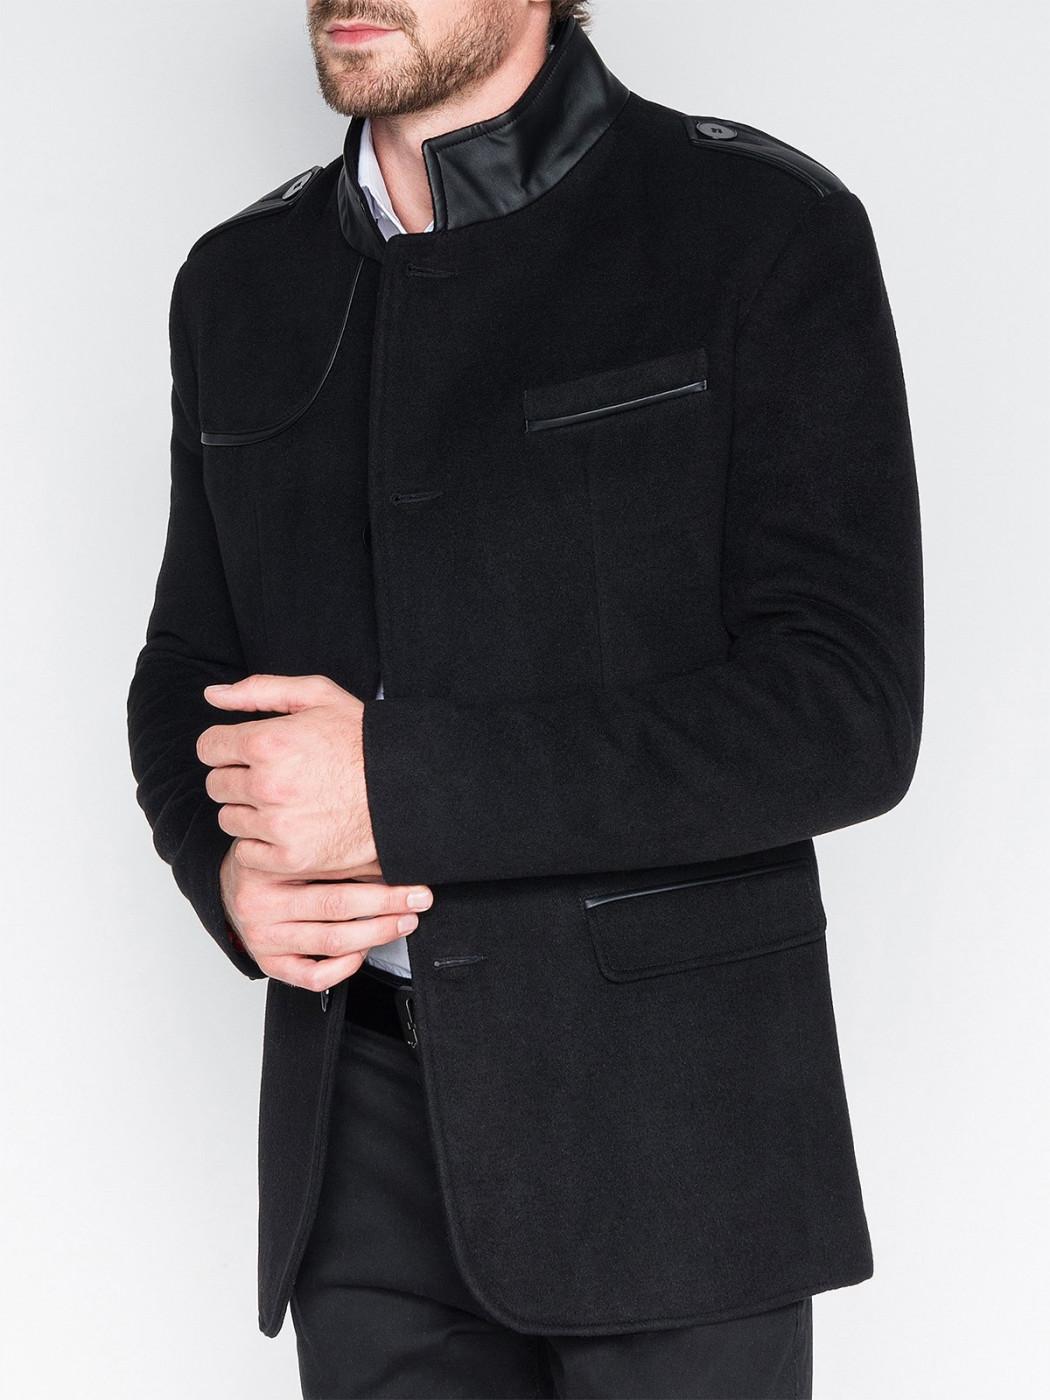 Ombre Clothing Men's coat C92 Augustin